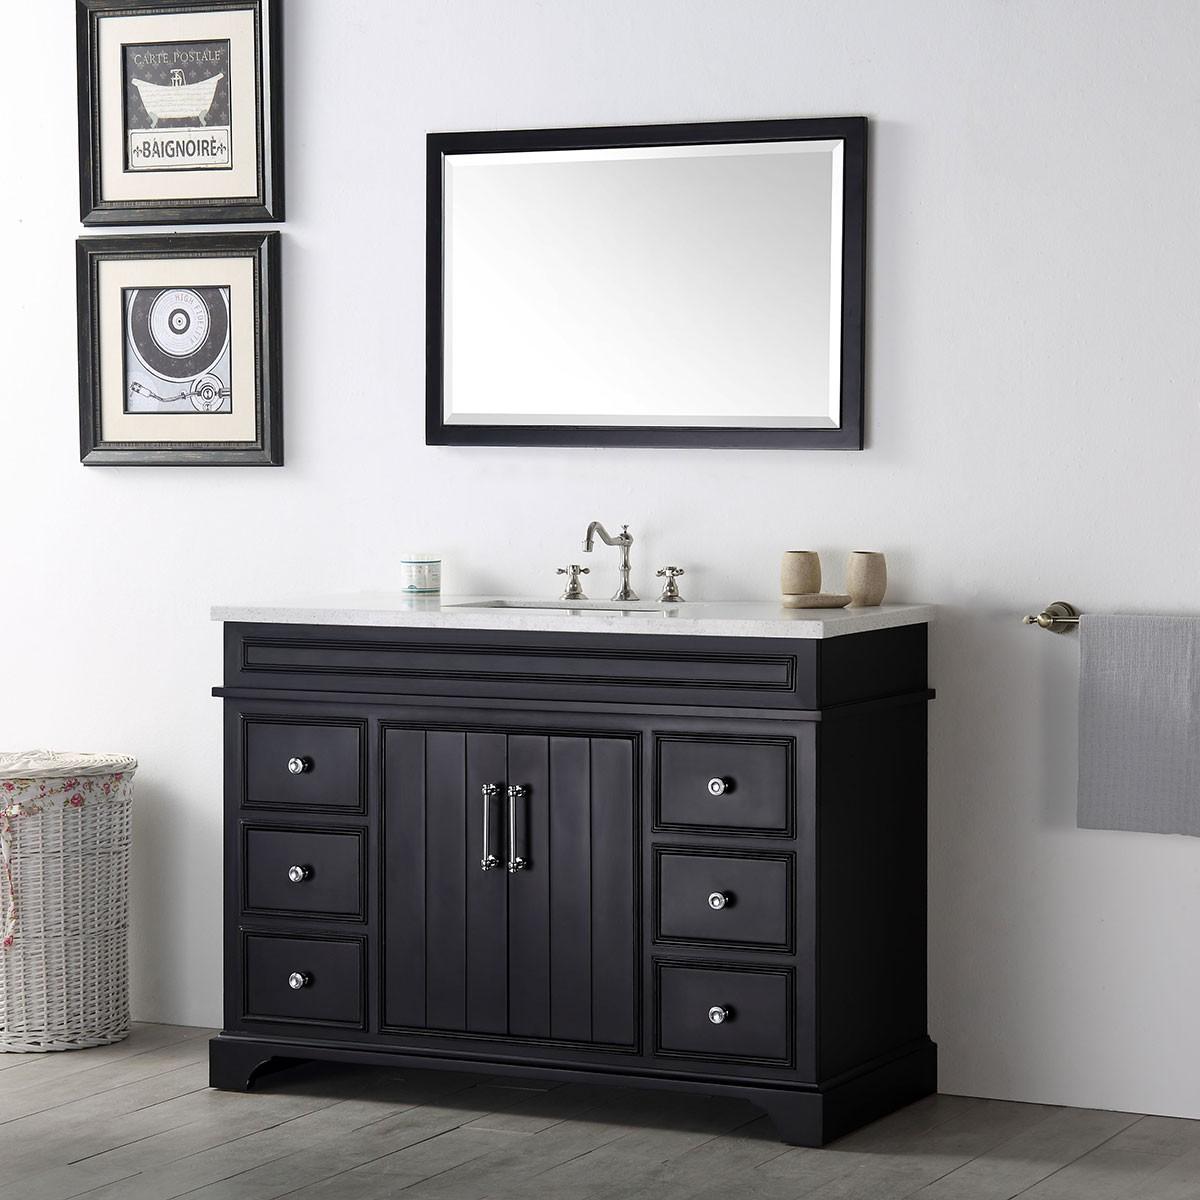 48 in bathroom vanity set without mirror dk 6748 e